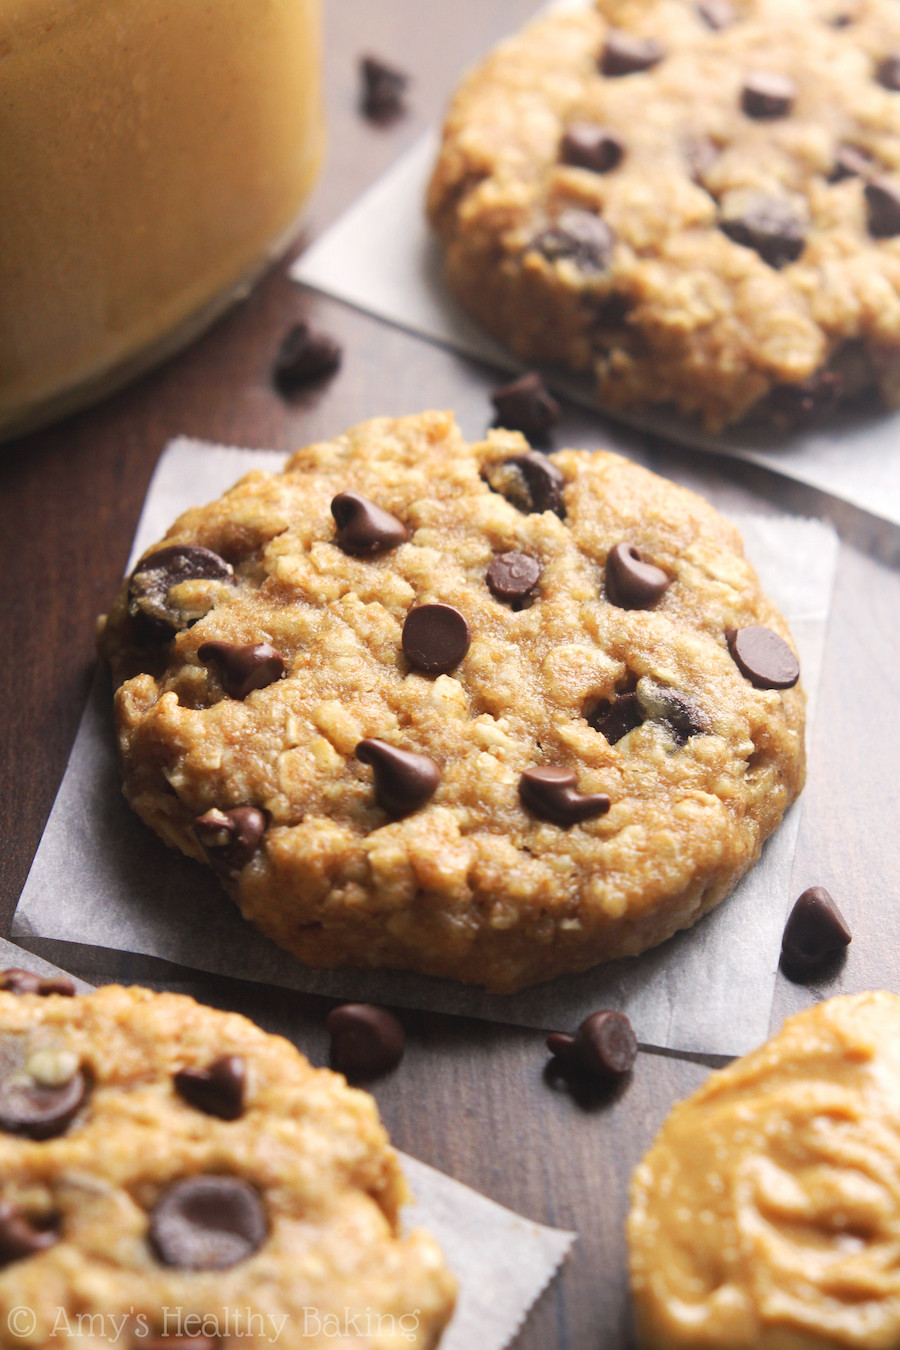 Healthy Peanut Butter Oatmeal Cookies Recipe  Chocolate Chip Peanut Butter Oatmeal Cookies Recipe Video